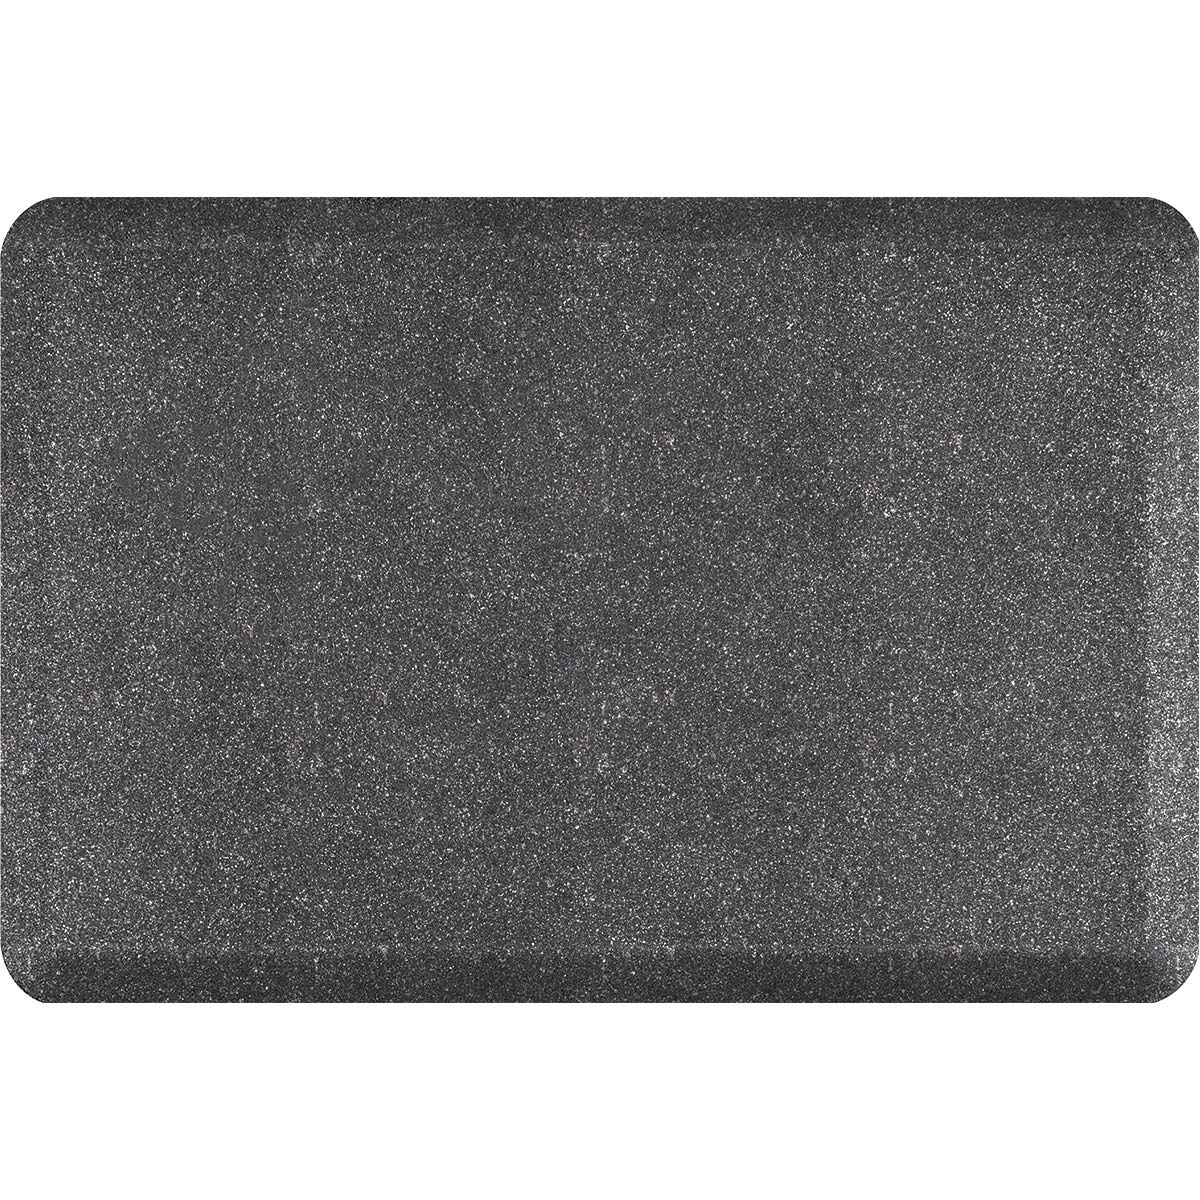 WellnessMats Granite Anti-Fatigue Mat - Comfort, Support & Style - Non-Slip, Non-Toxic - 3'x2'x 3/4'' Granite Steel